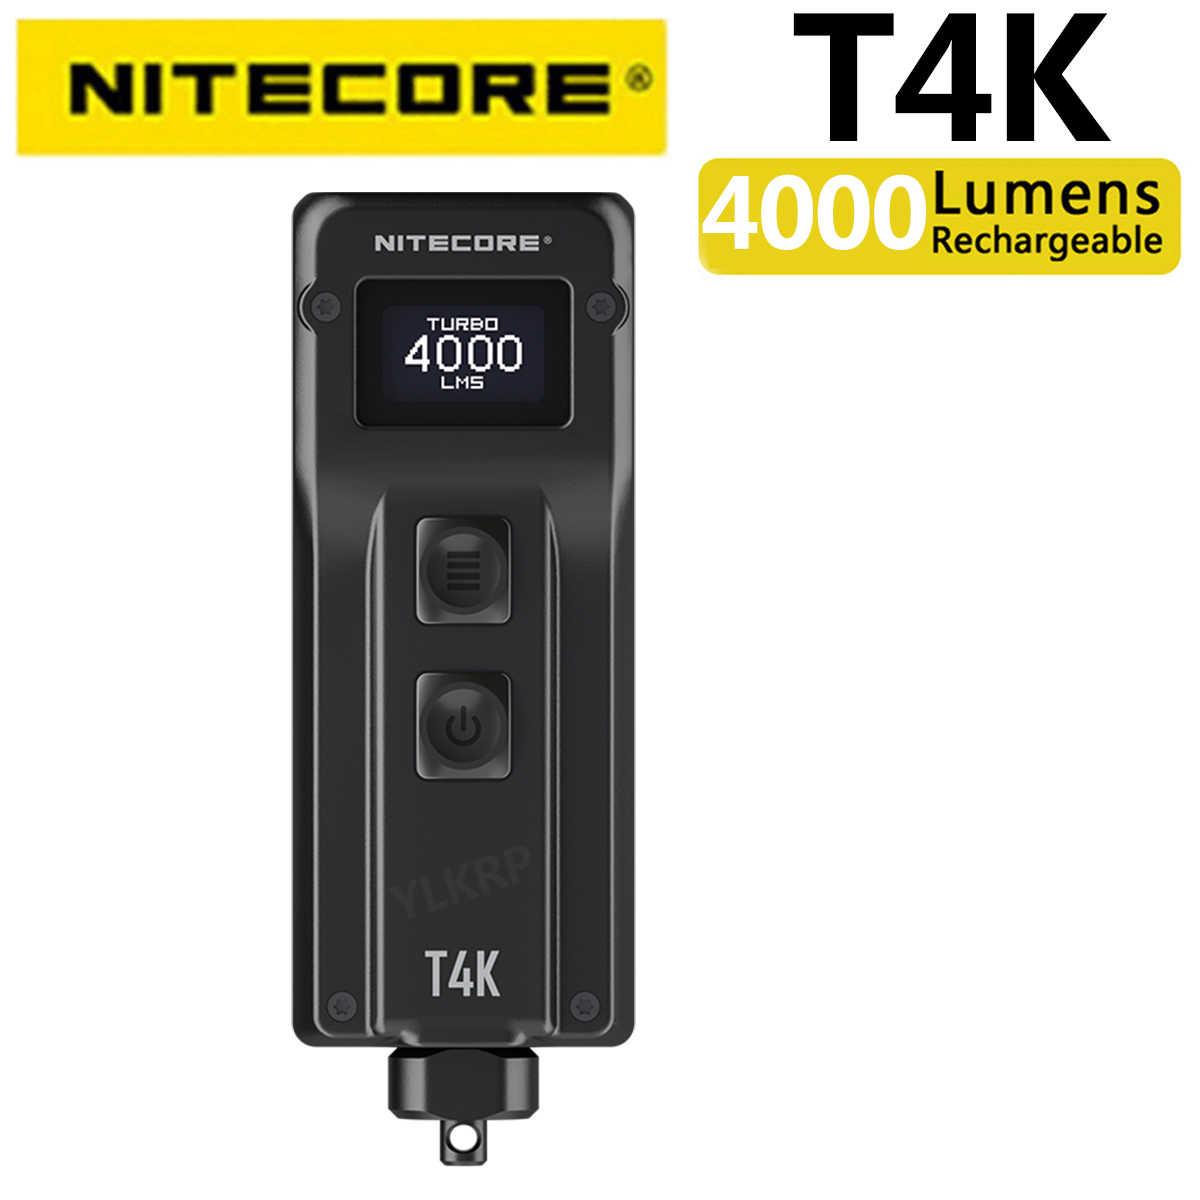 4X NITECORE 45 Lumens Usb Rechargeable Mini Keychain Led Flashlight Edc Tor M3Y4